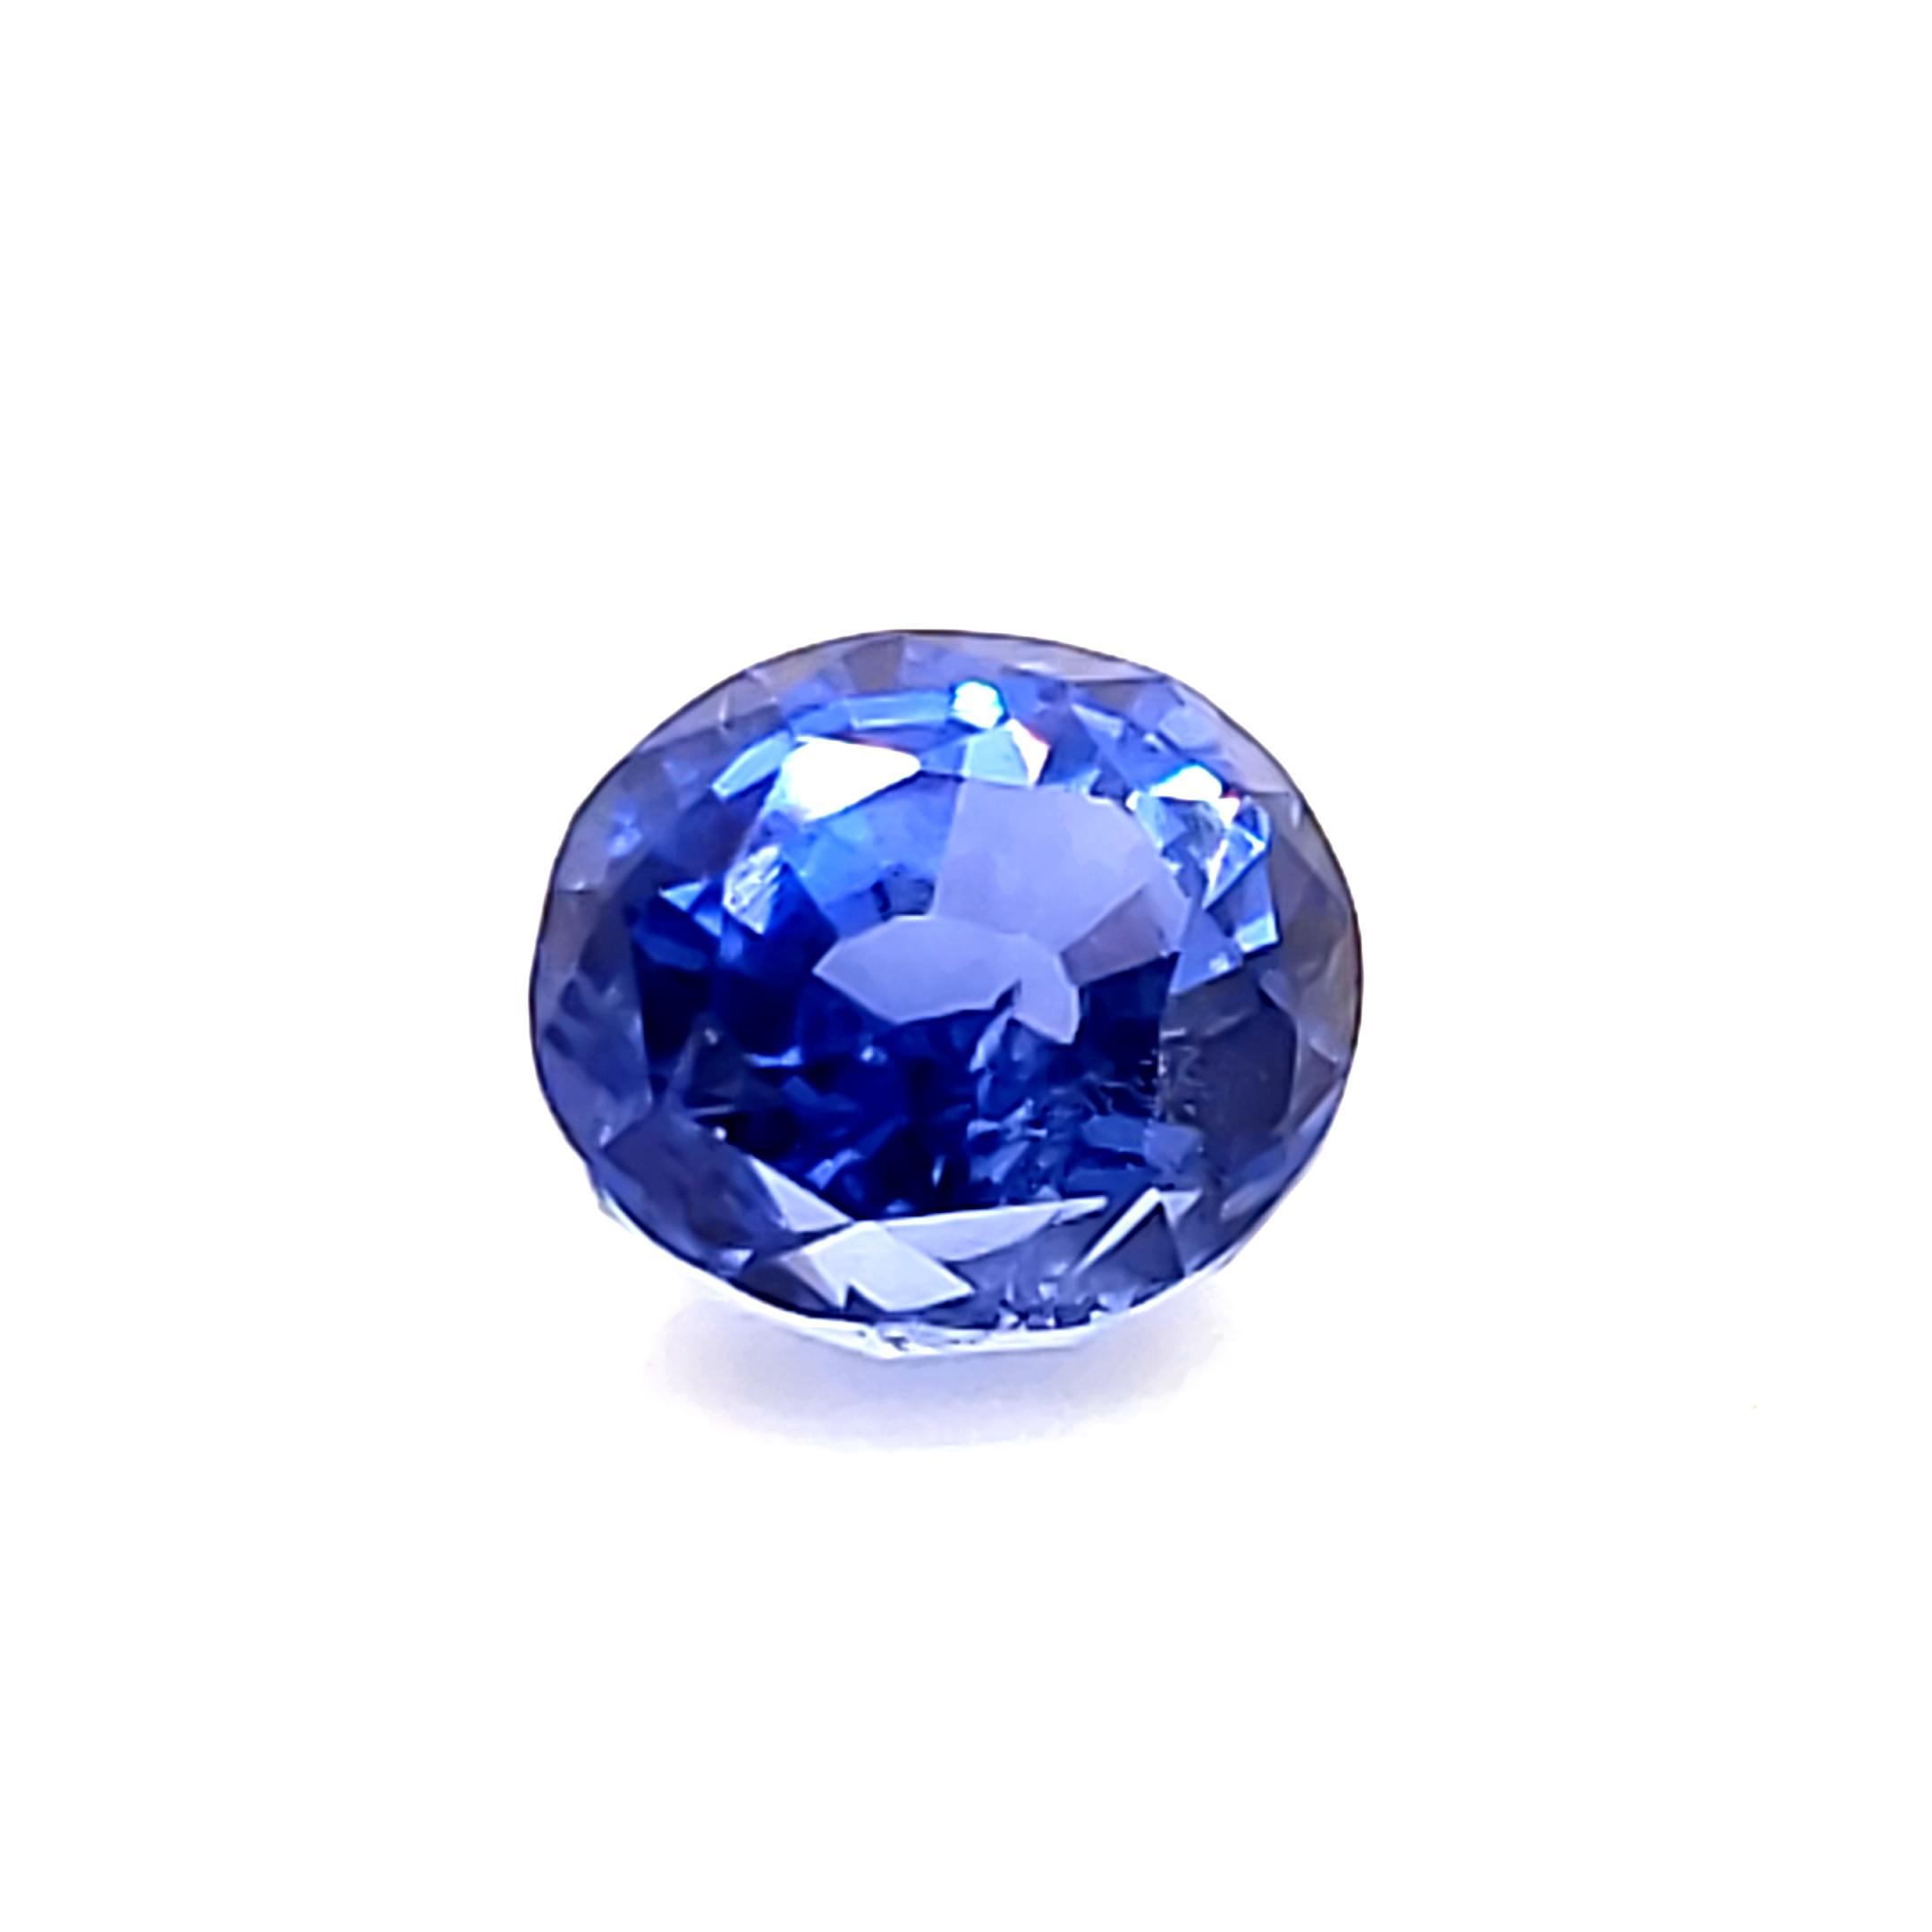 2.52 ct. Blue Sapphire